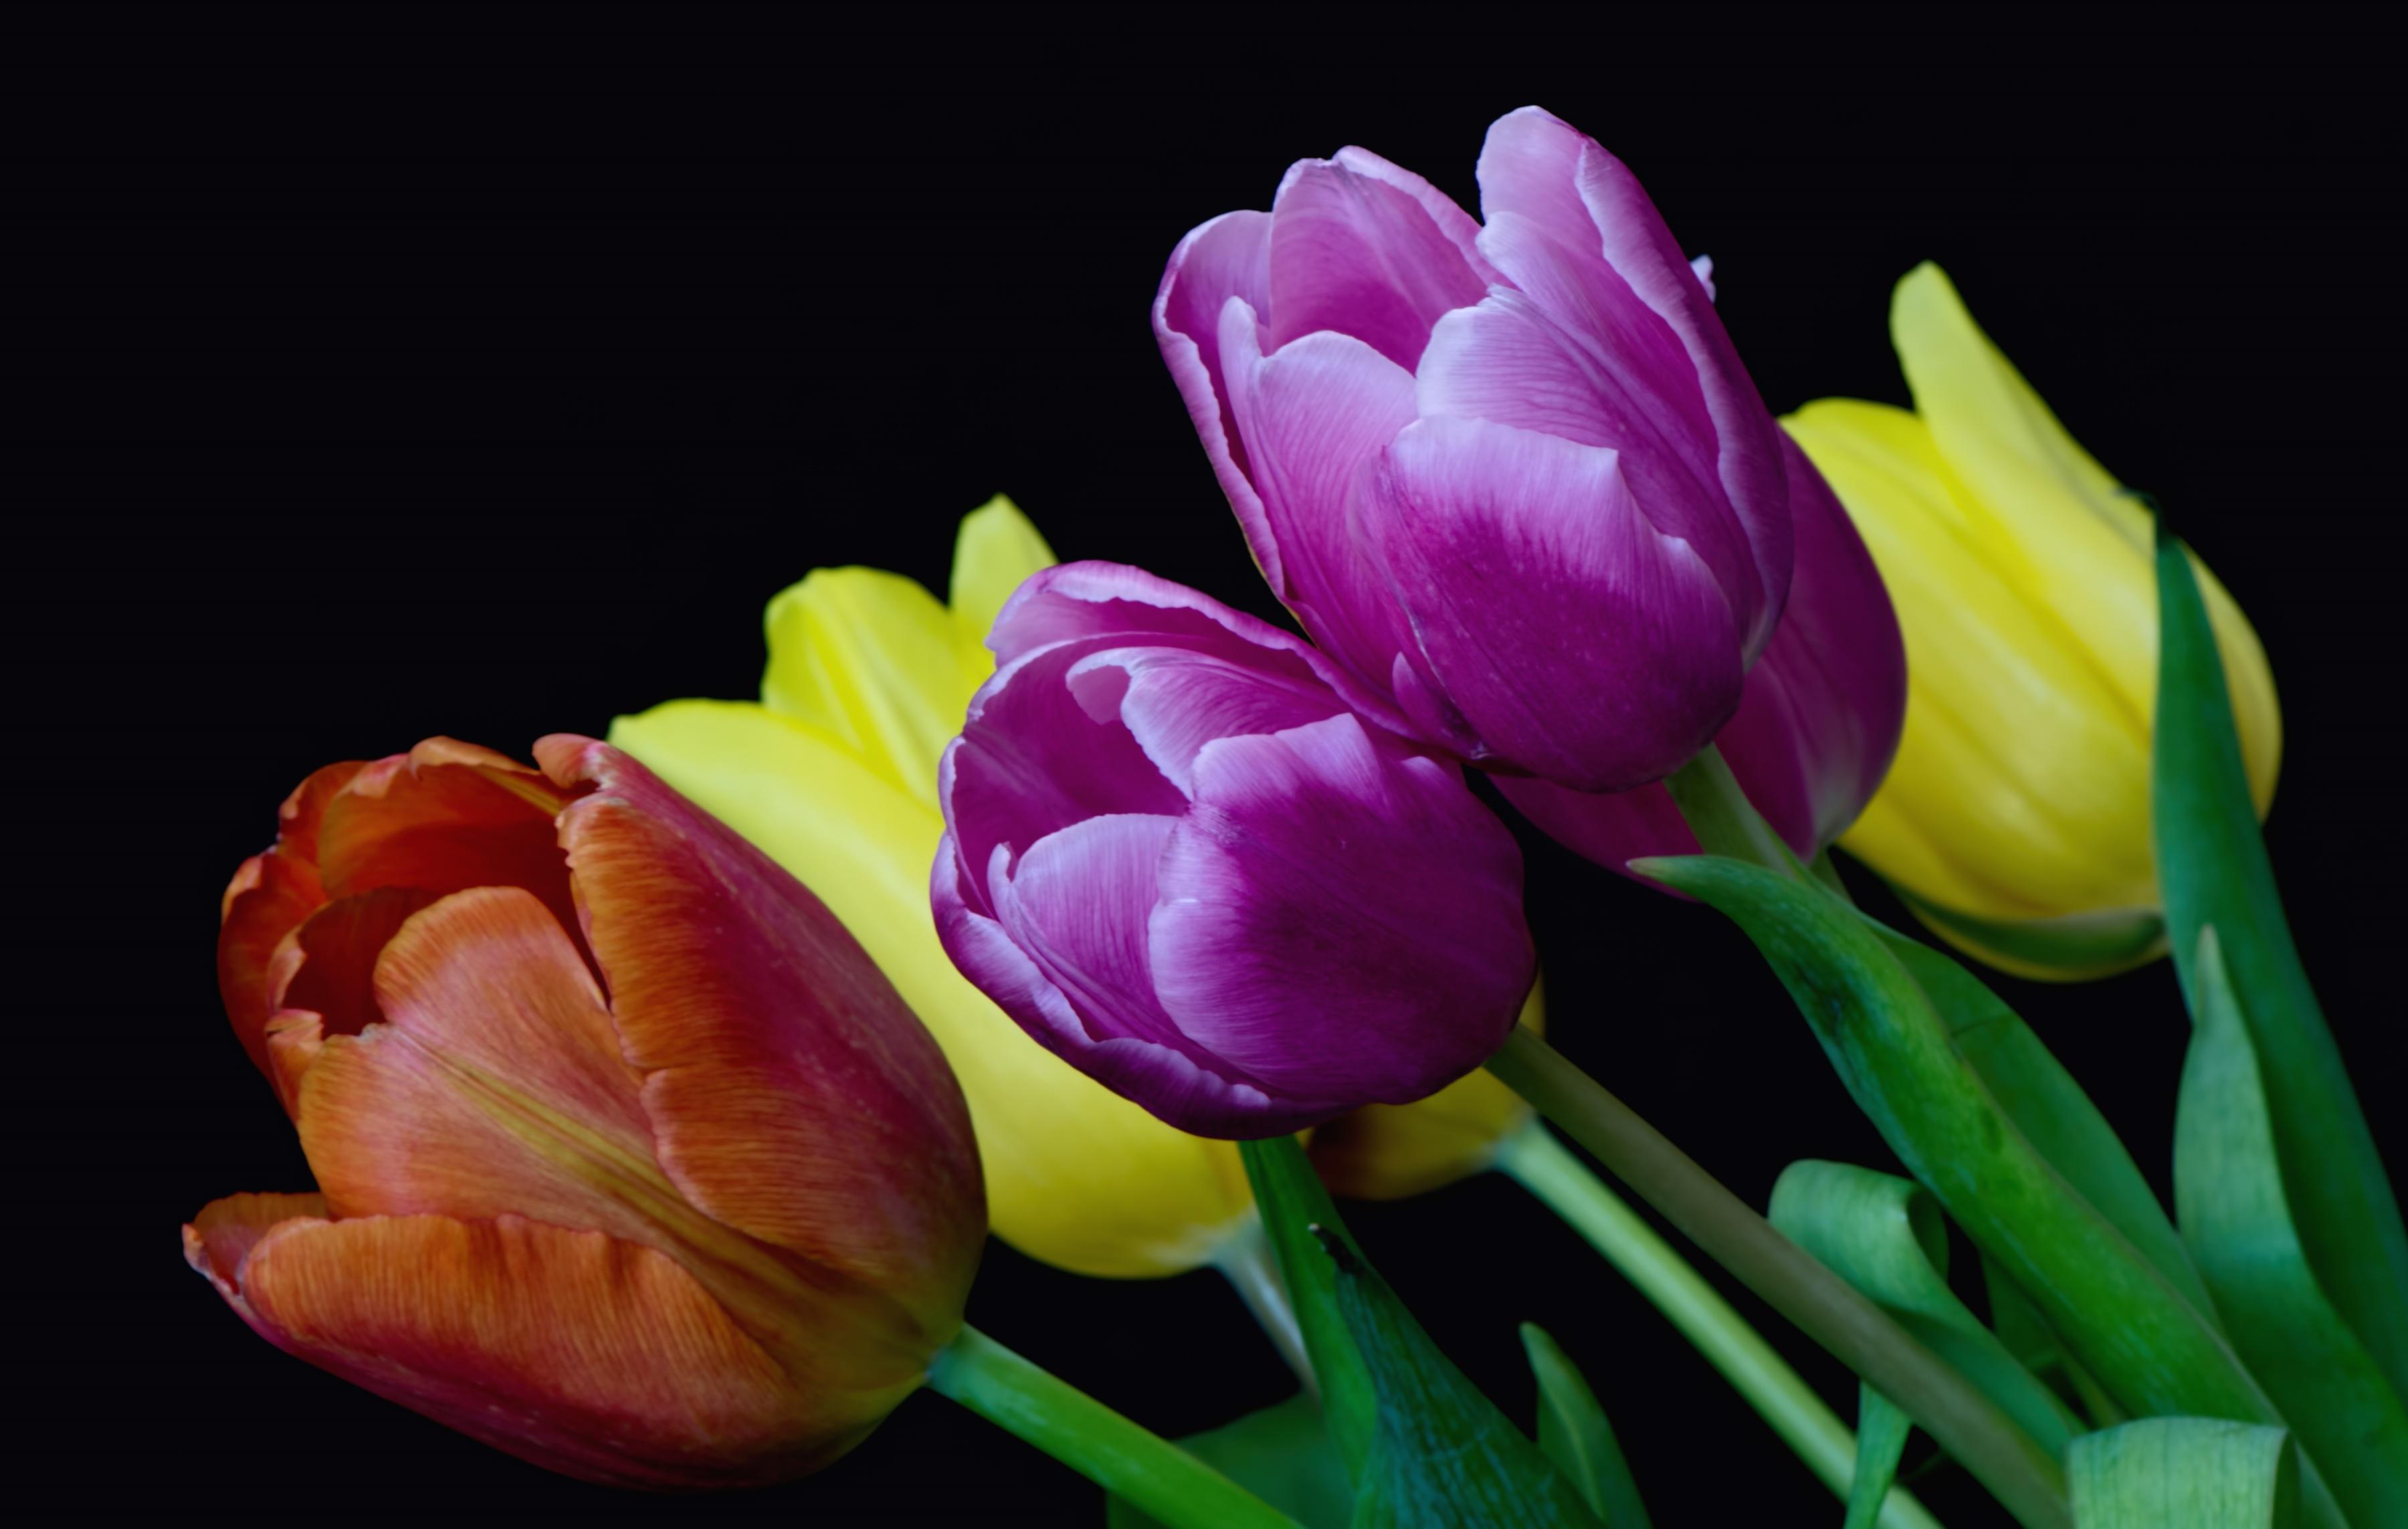 Обои На Телефон Тюльпаны